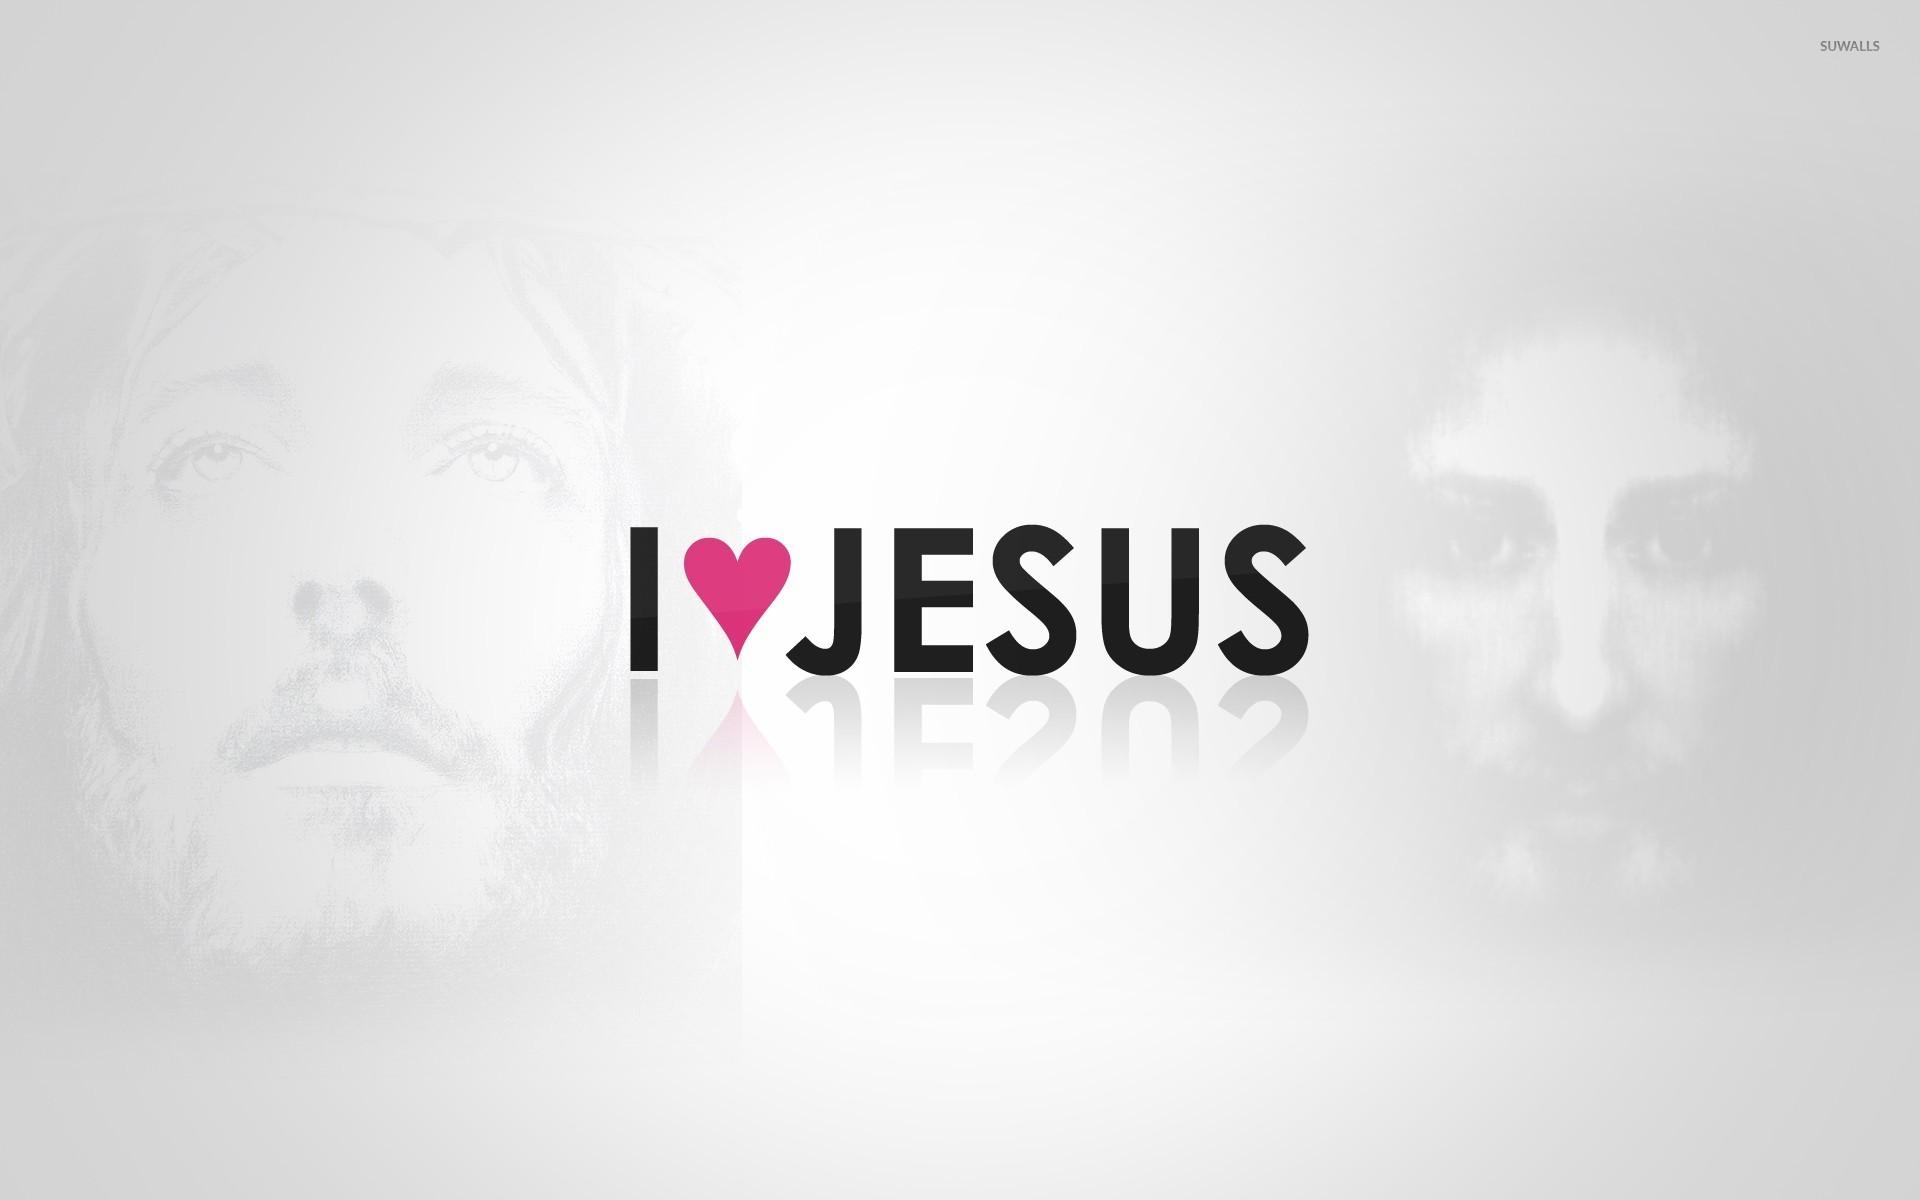 I love Jesus wallpaper   Religion wallpapers   30519 1920x1200